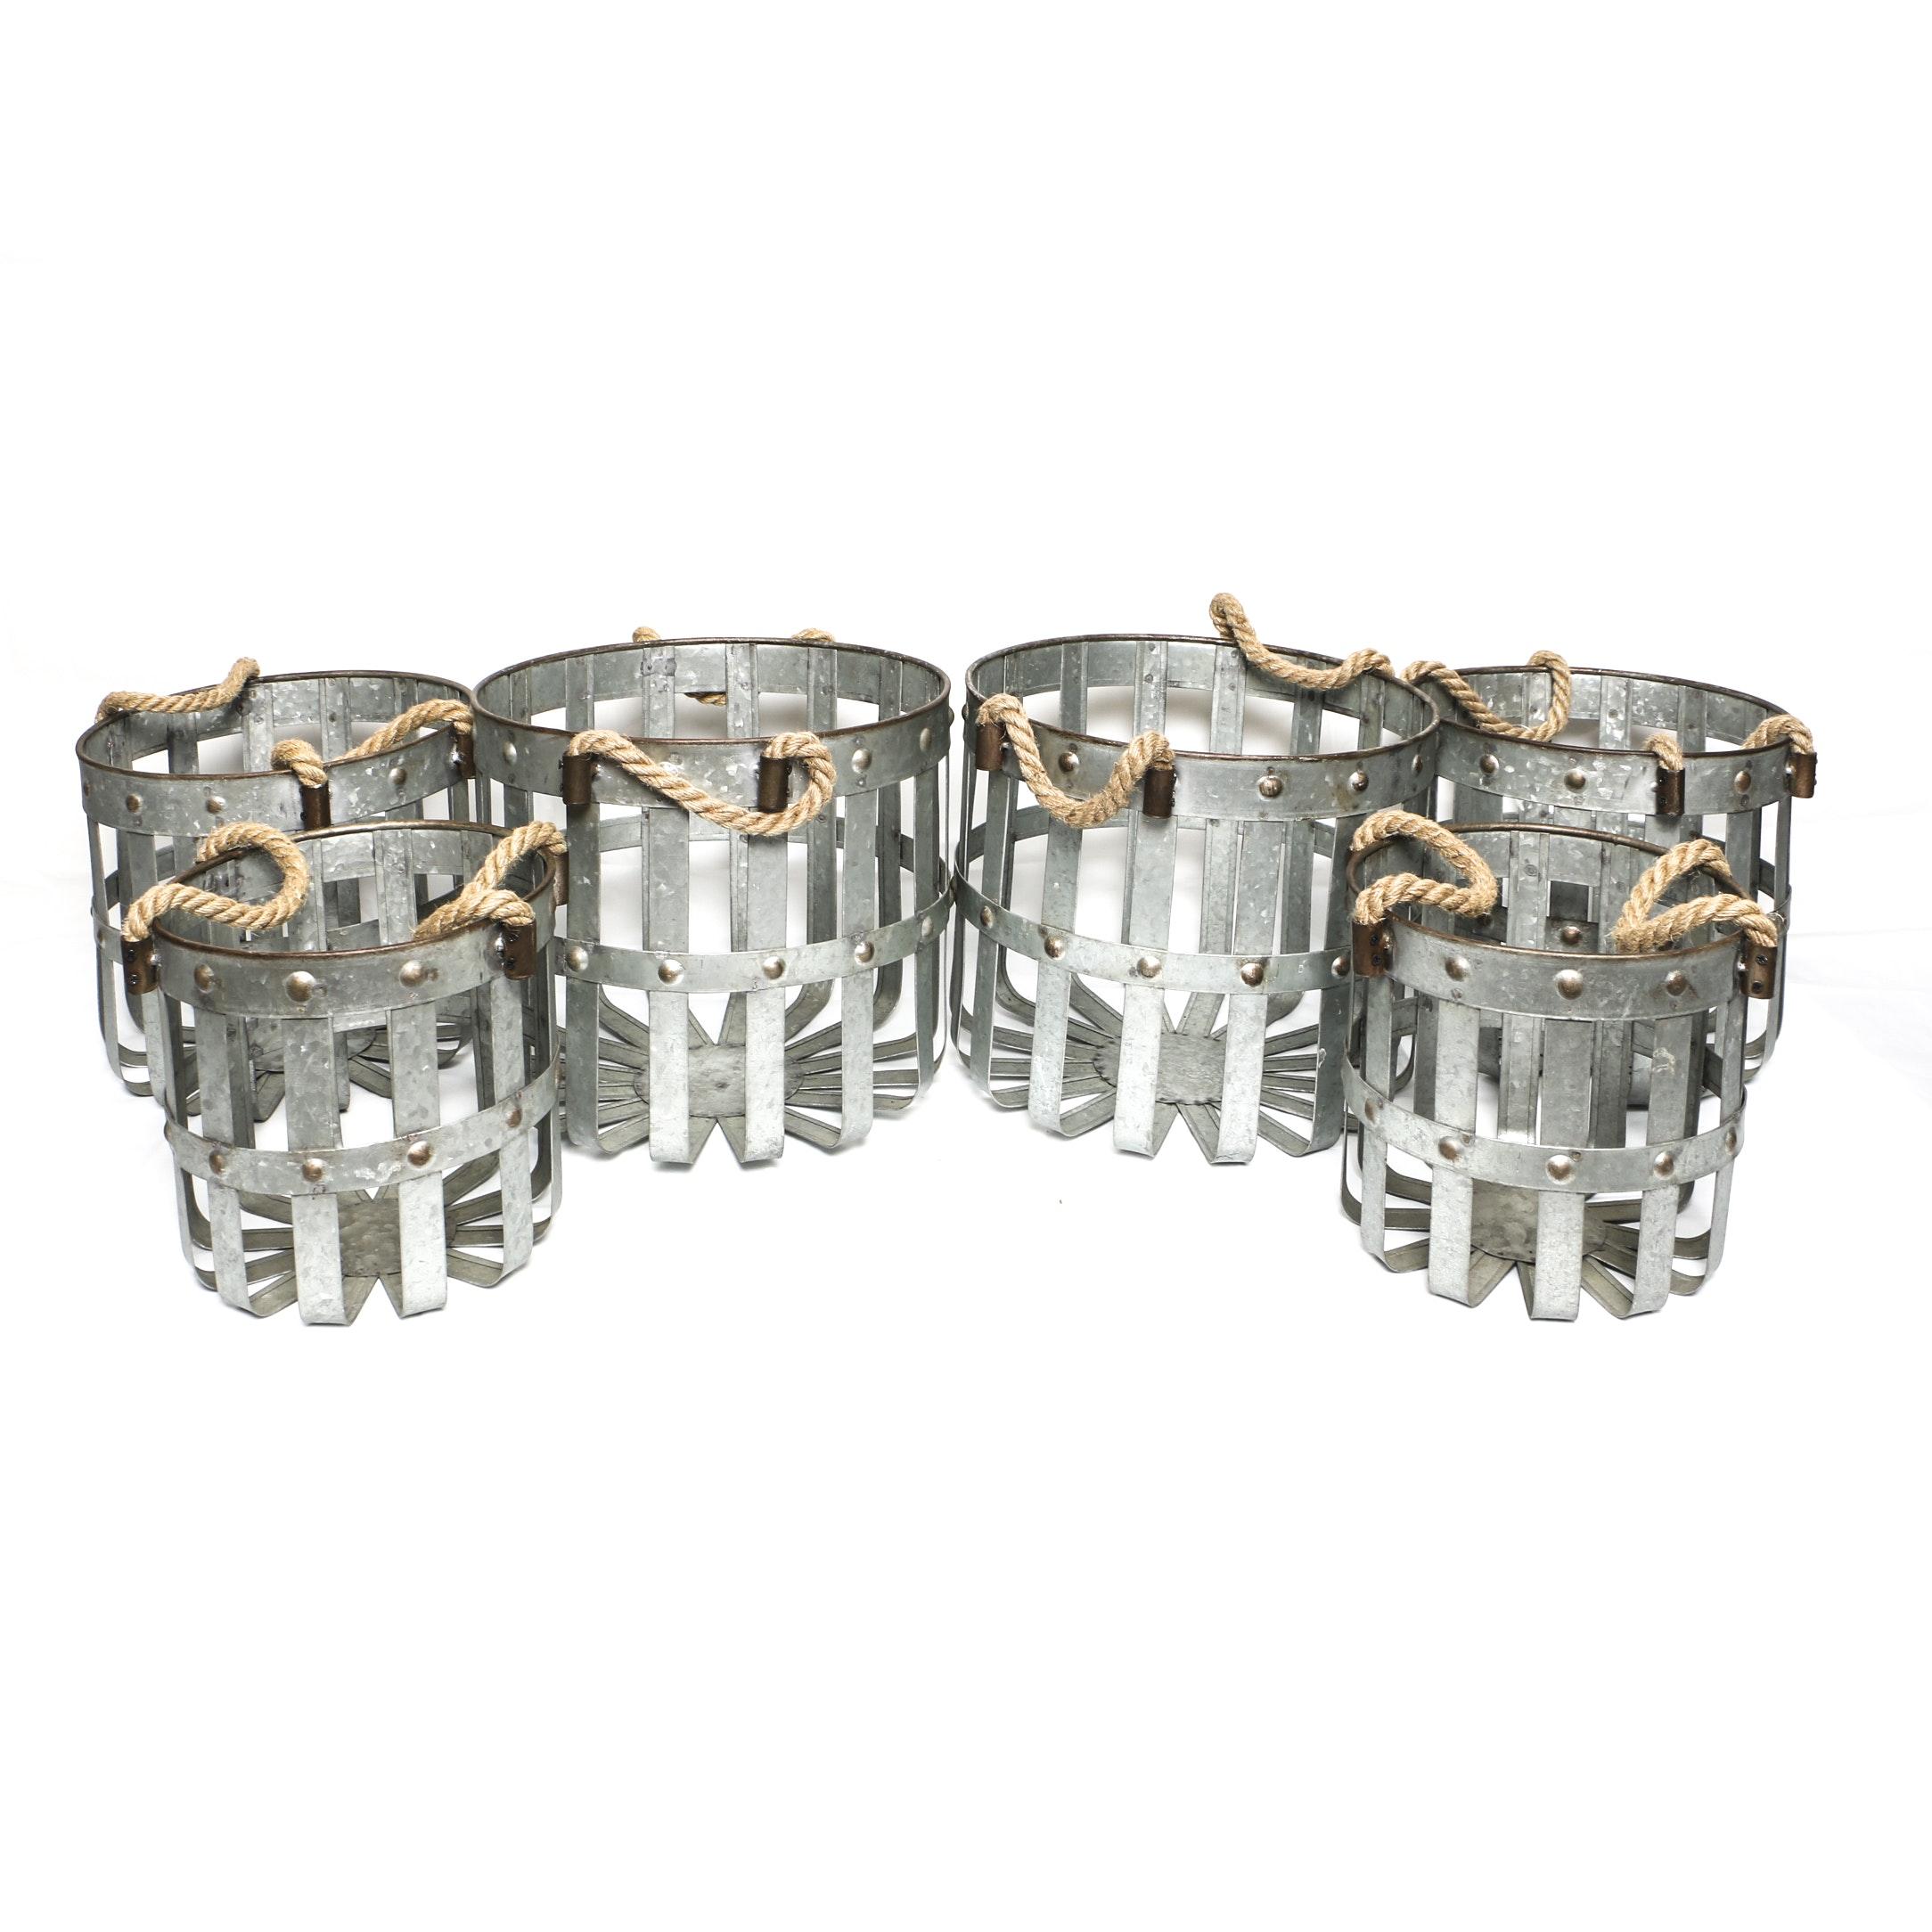 Decorative Metal Storage Baskets